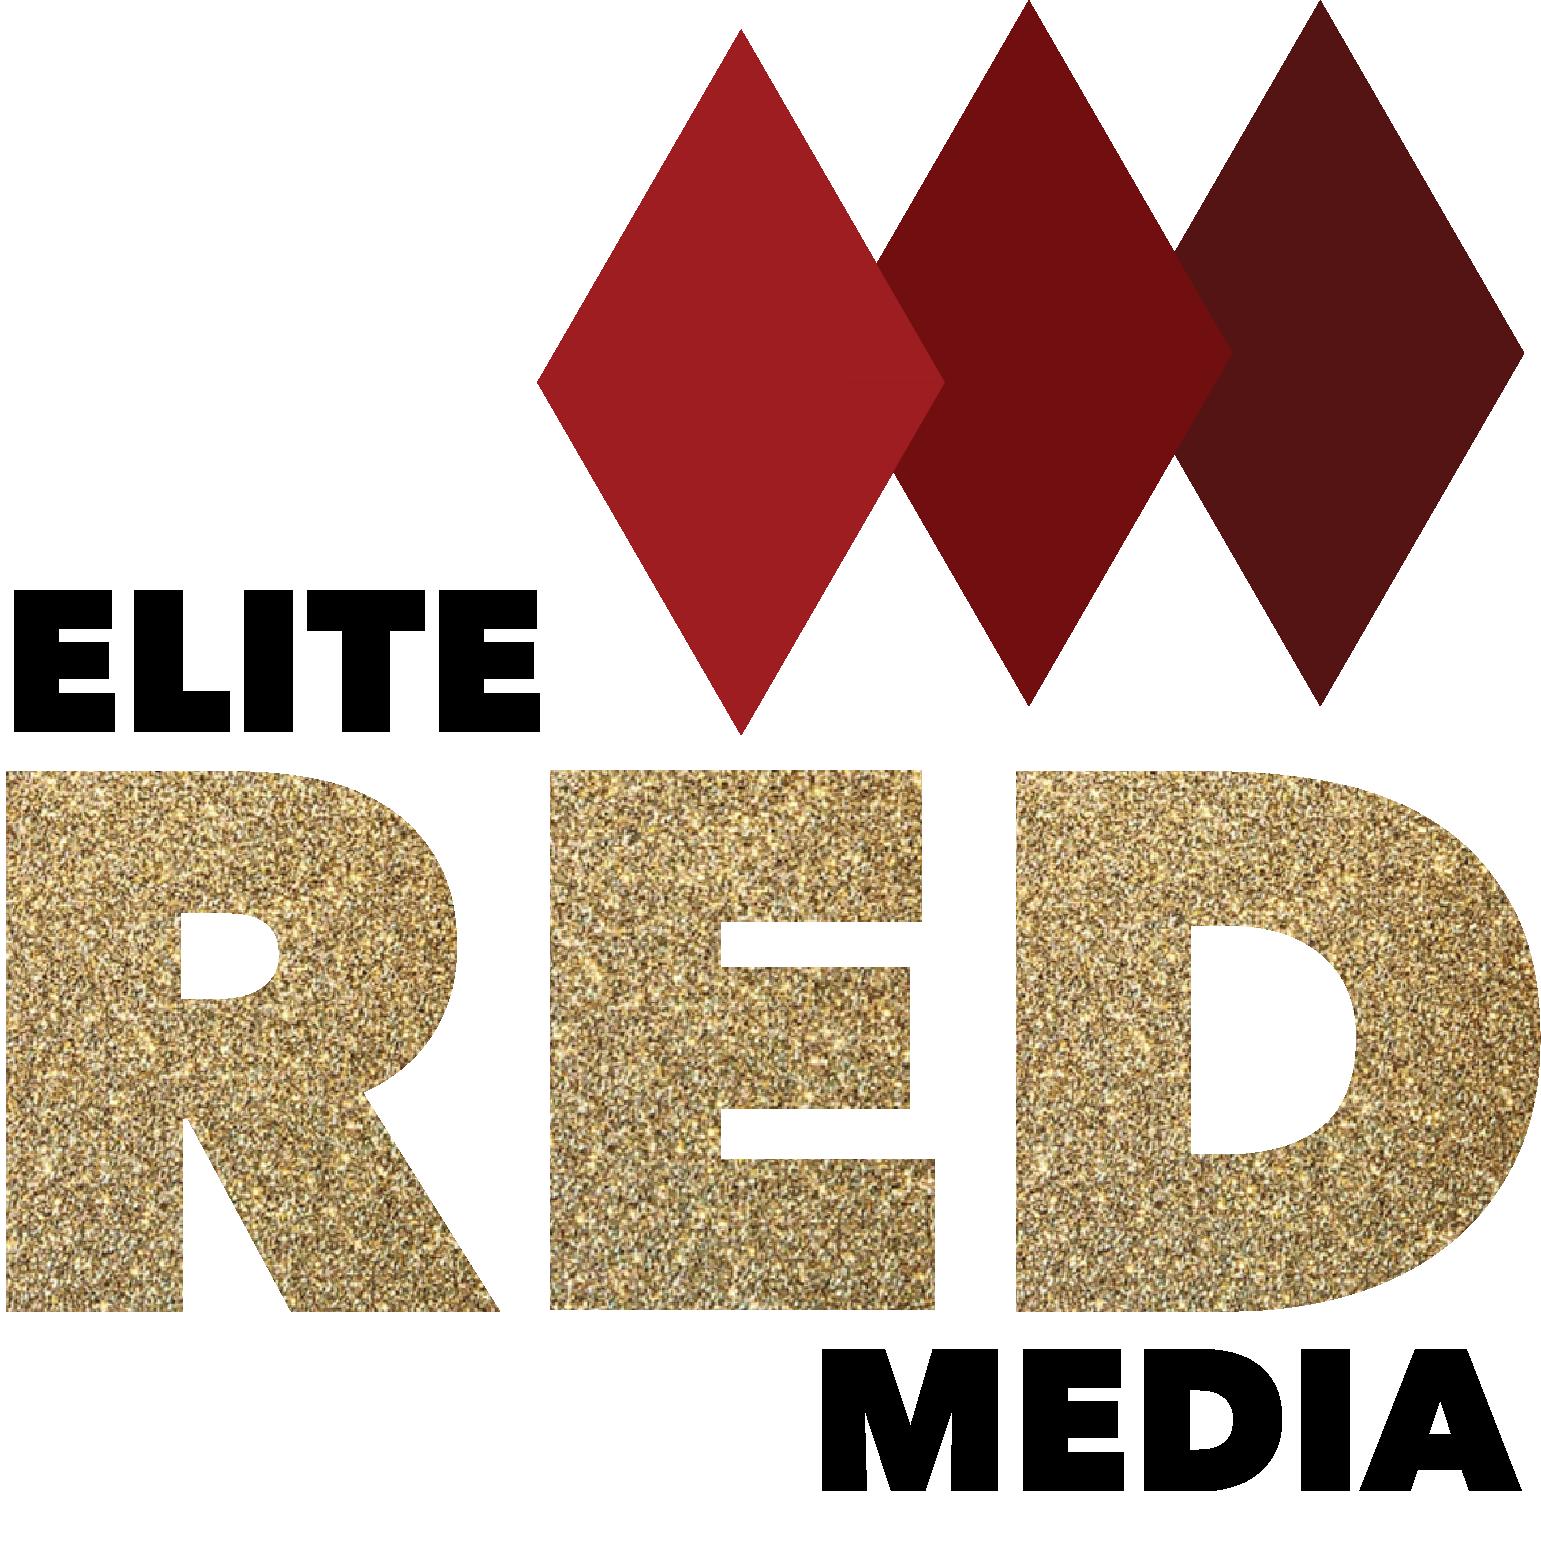 ELITE RED MEDIA